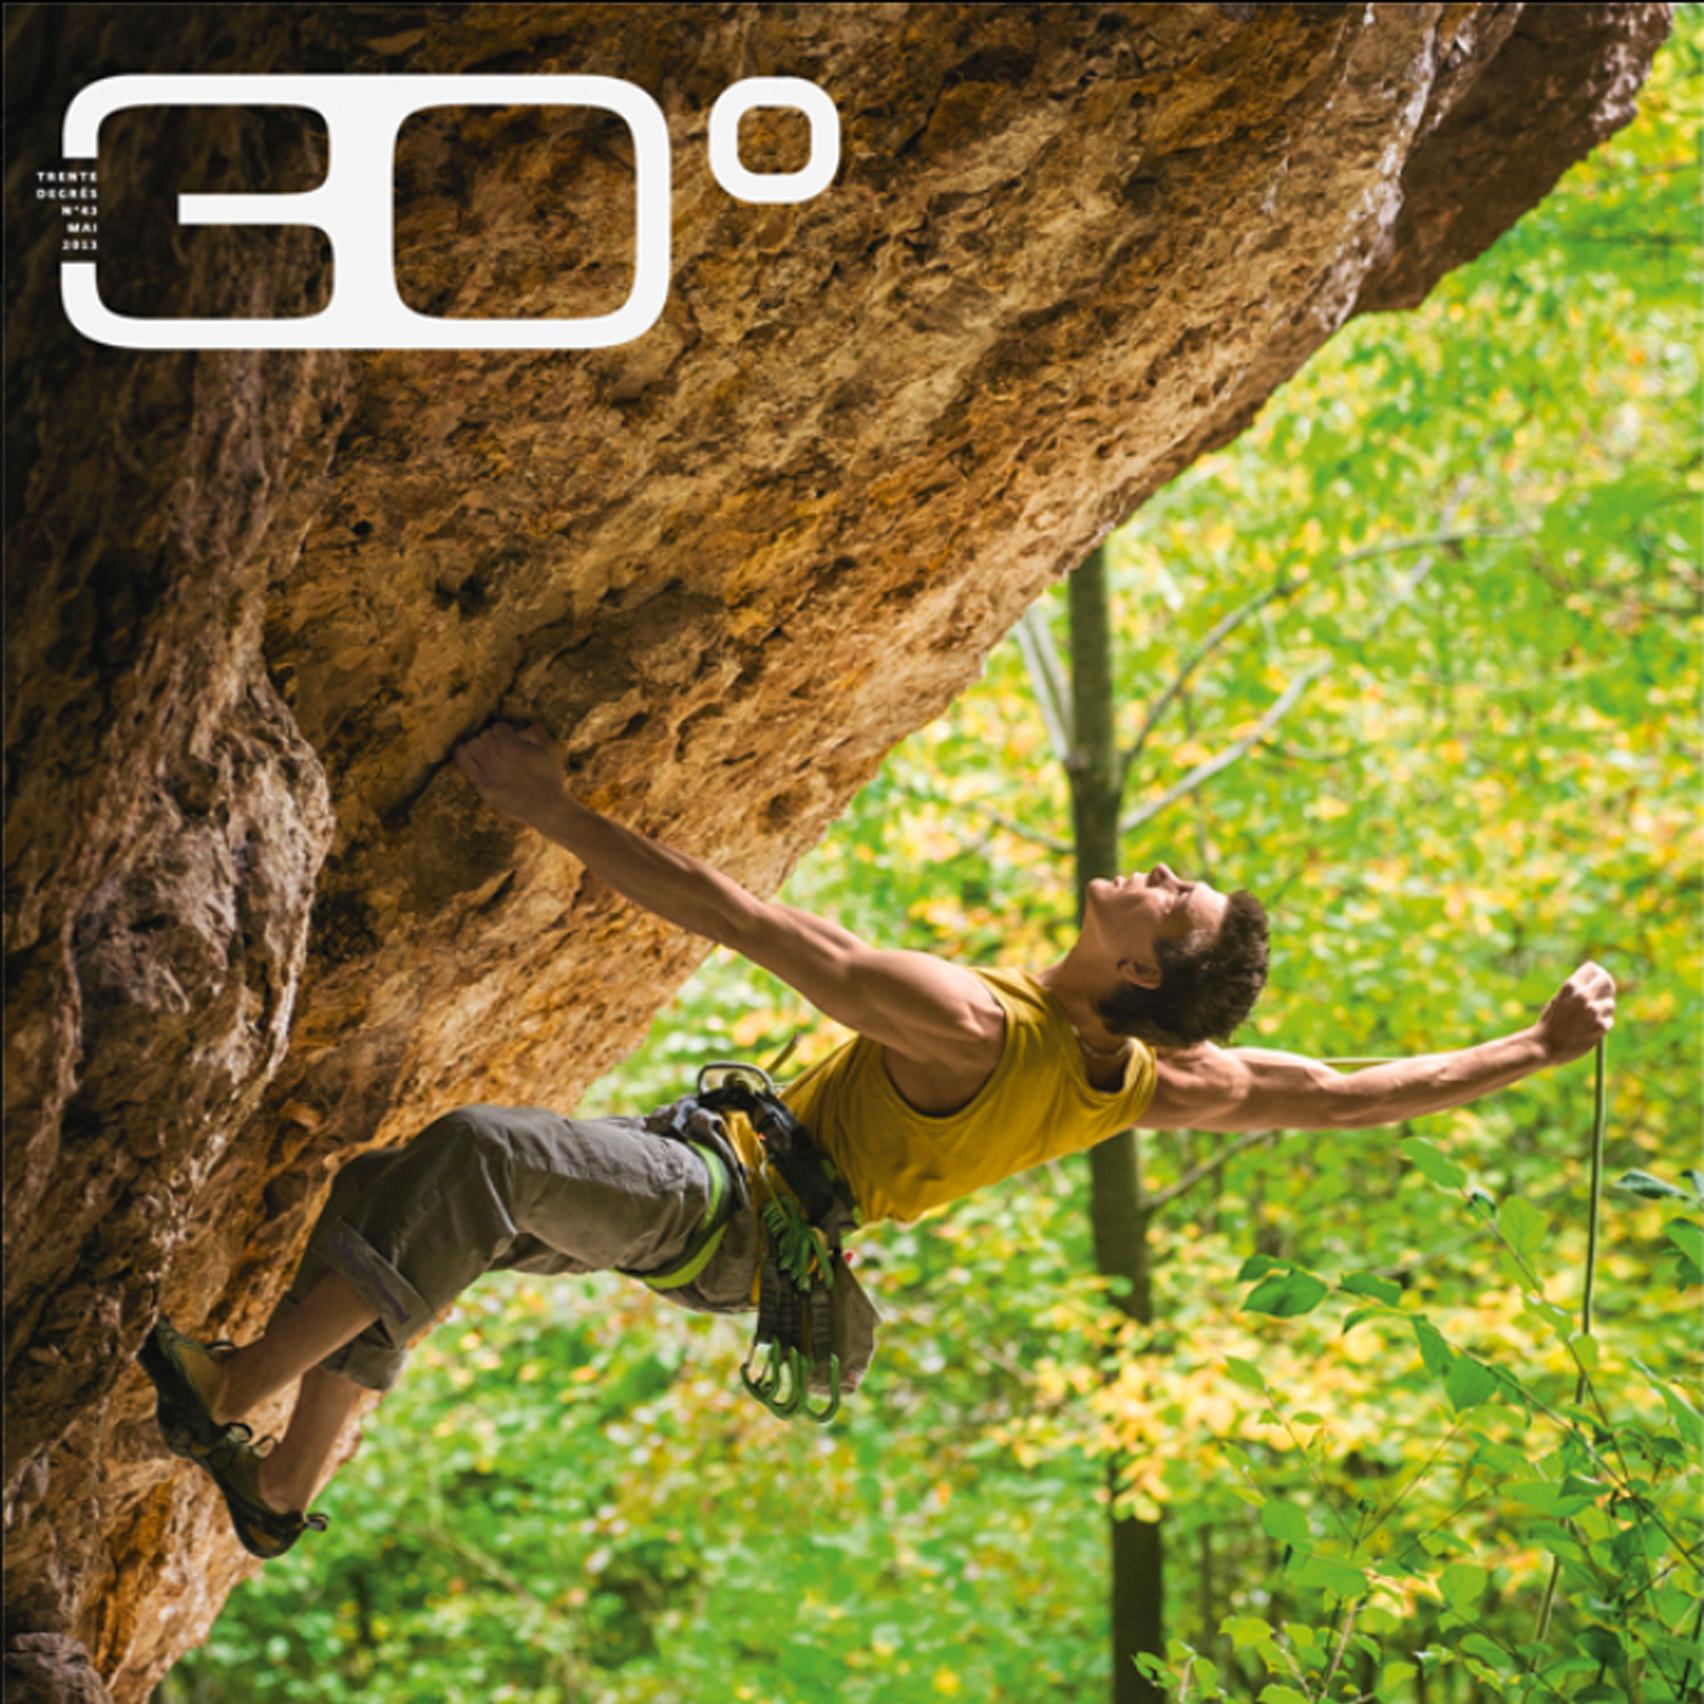 30° Degrés Magazine, Outdoorfotografie, Kletterfotograf, Sportfotografie, Klettern